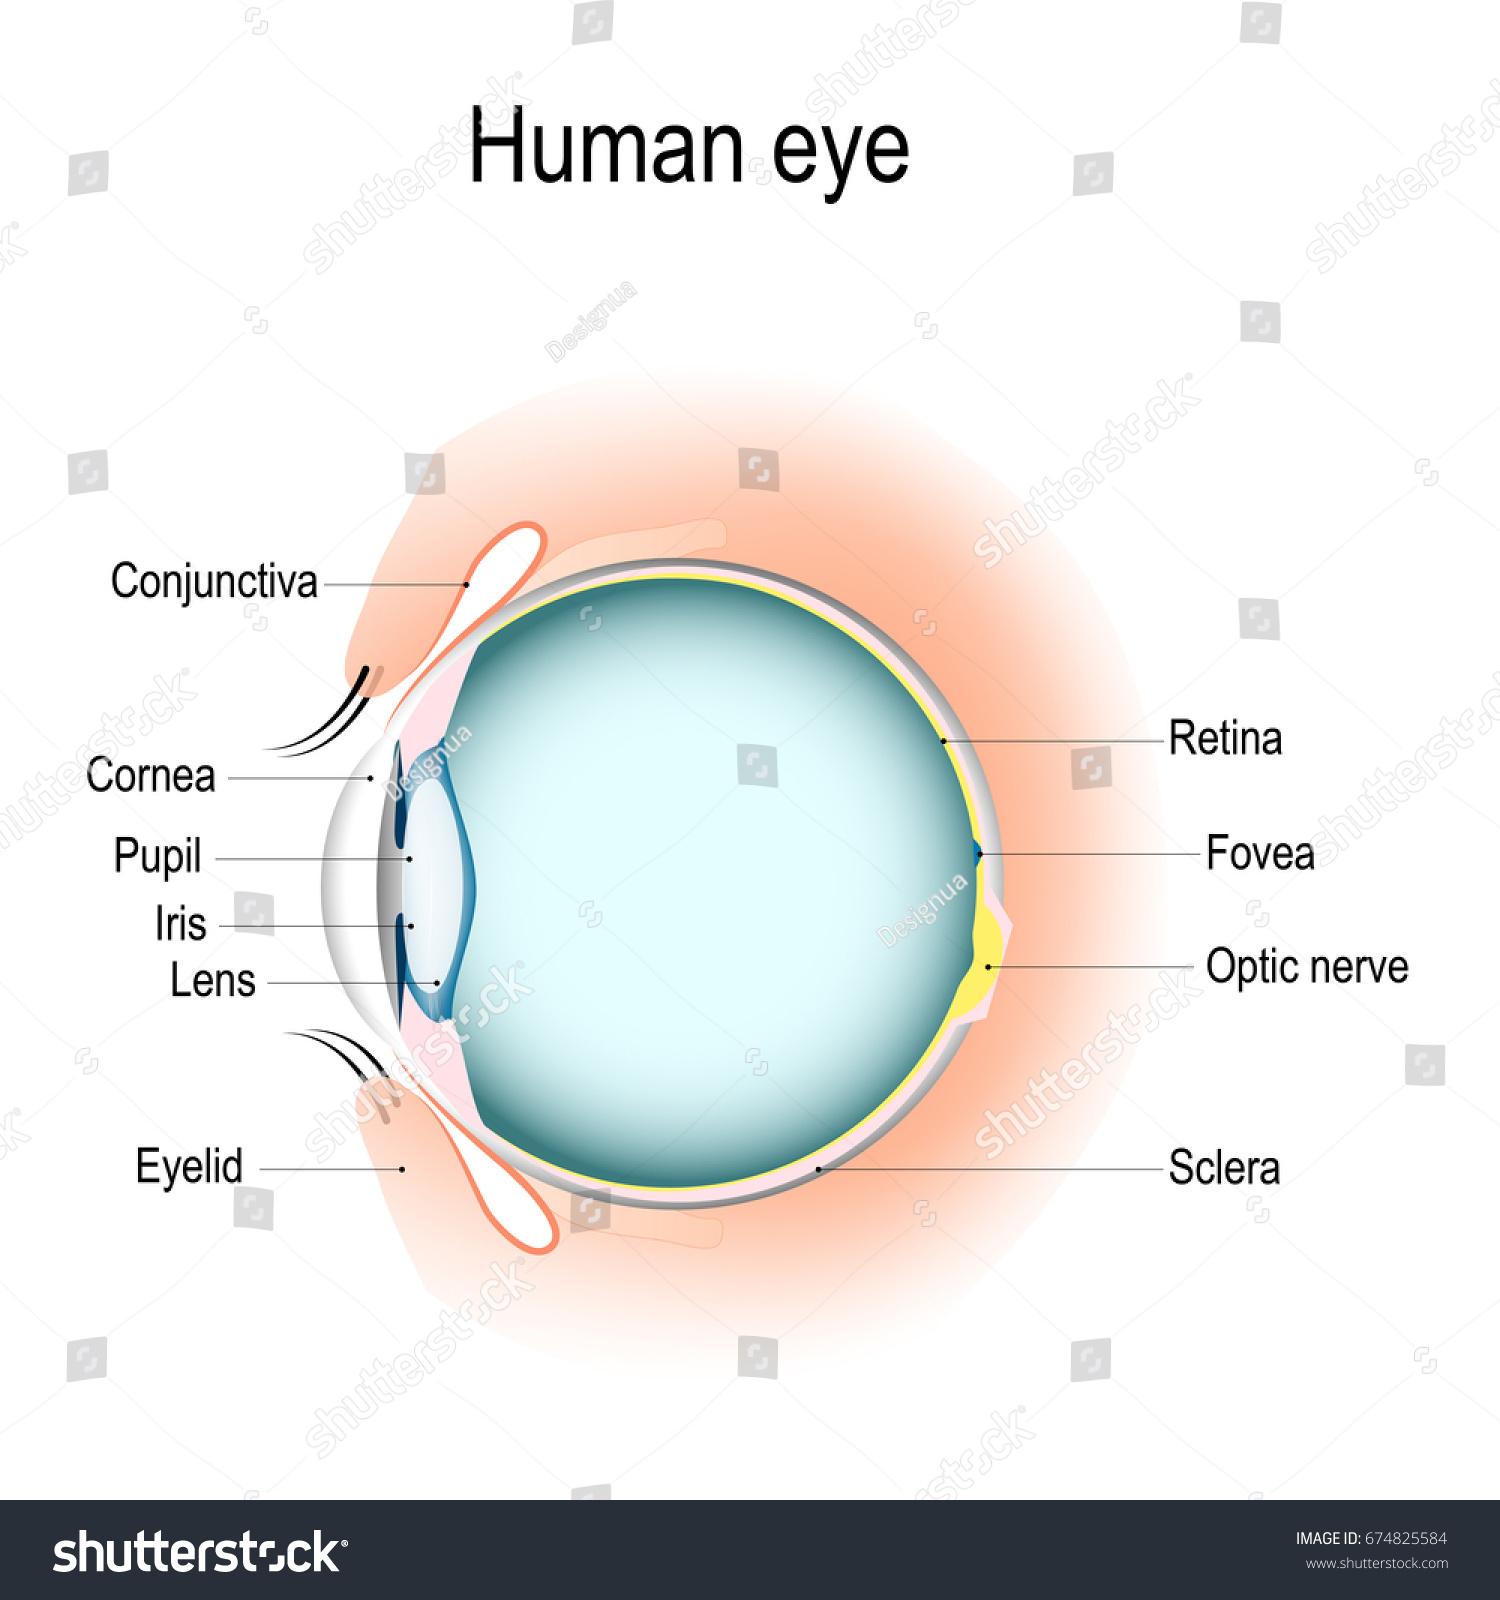 Anatomy Human Eye Vertical Section Eye Stock Vector (Royalty Free ...